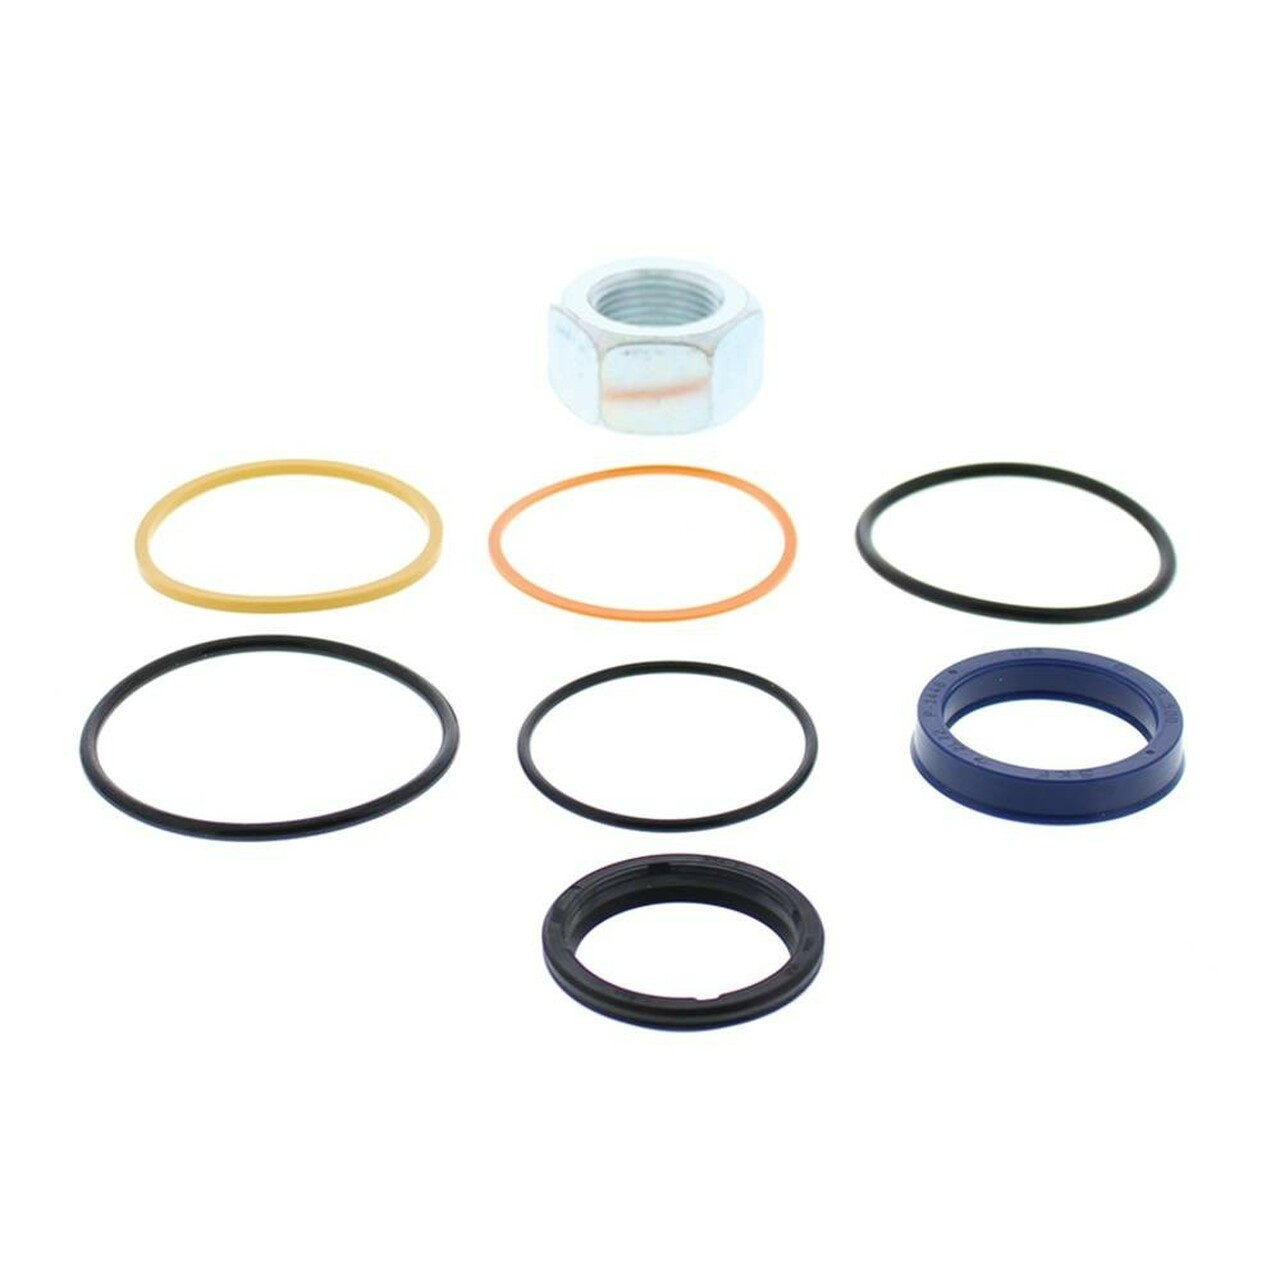 Hydraulic Cylinder Seal Kit For Bobcat 773 Skid Steer S175 Skid Steer